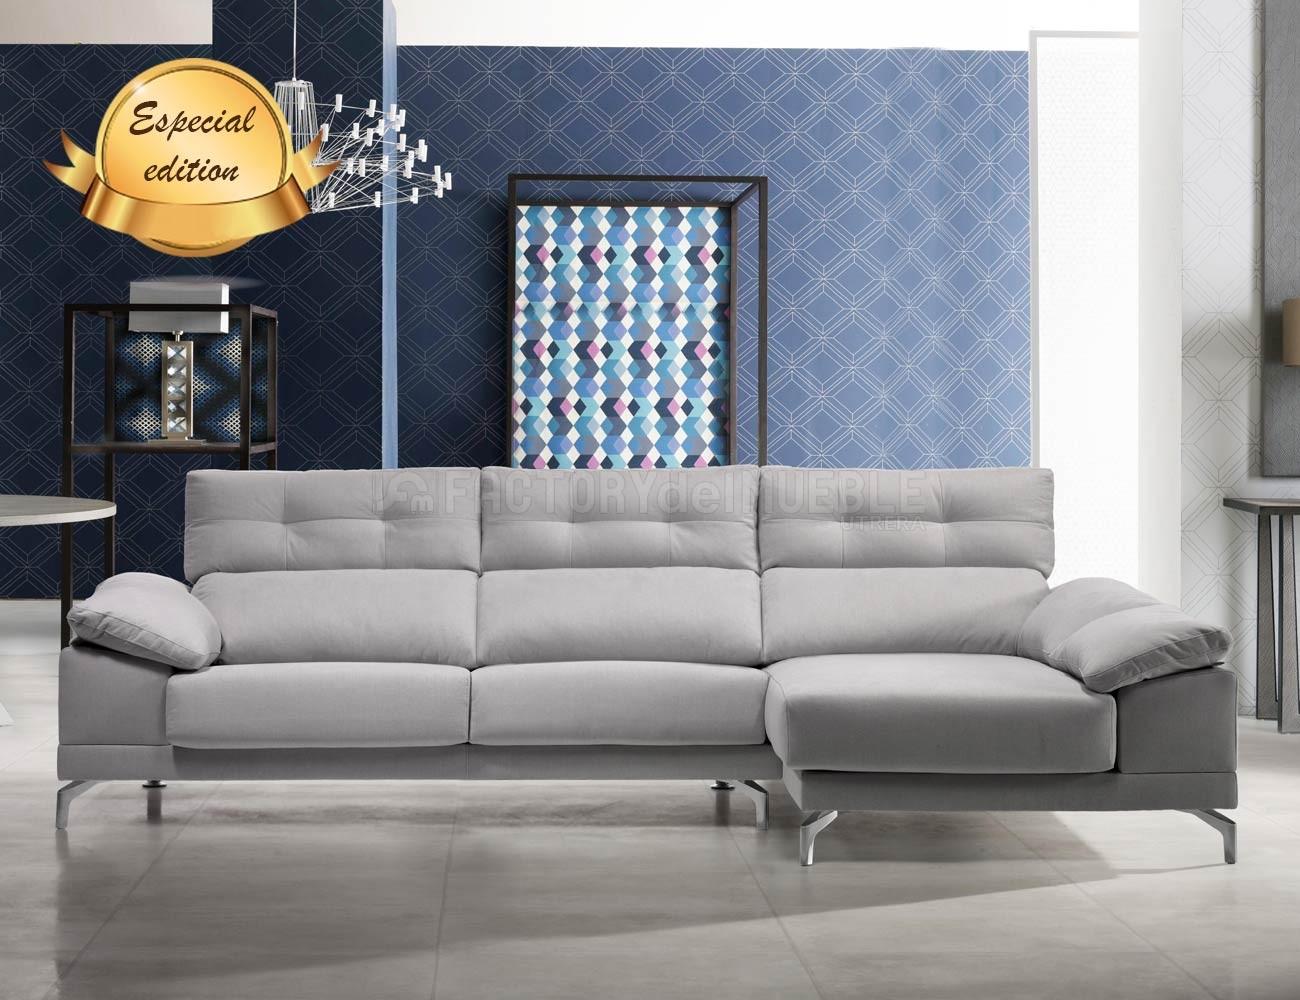 Sofa chaiselongue 1